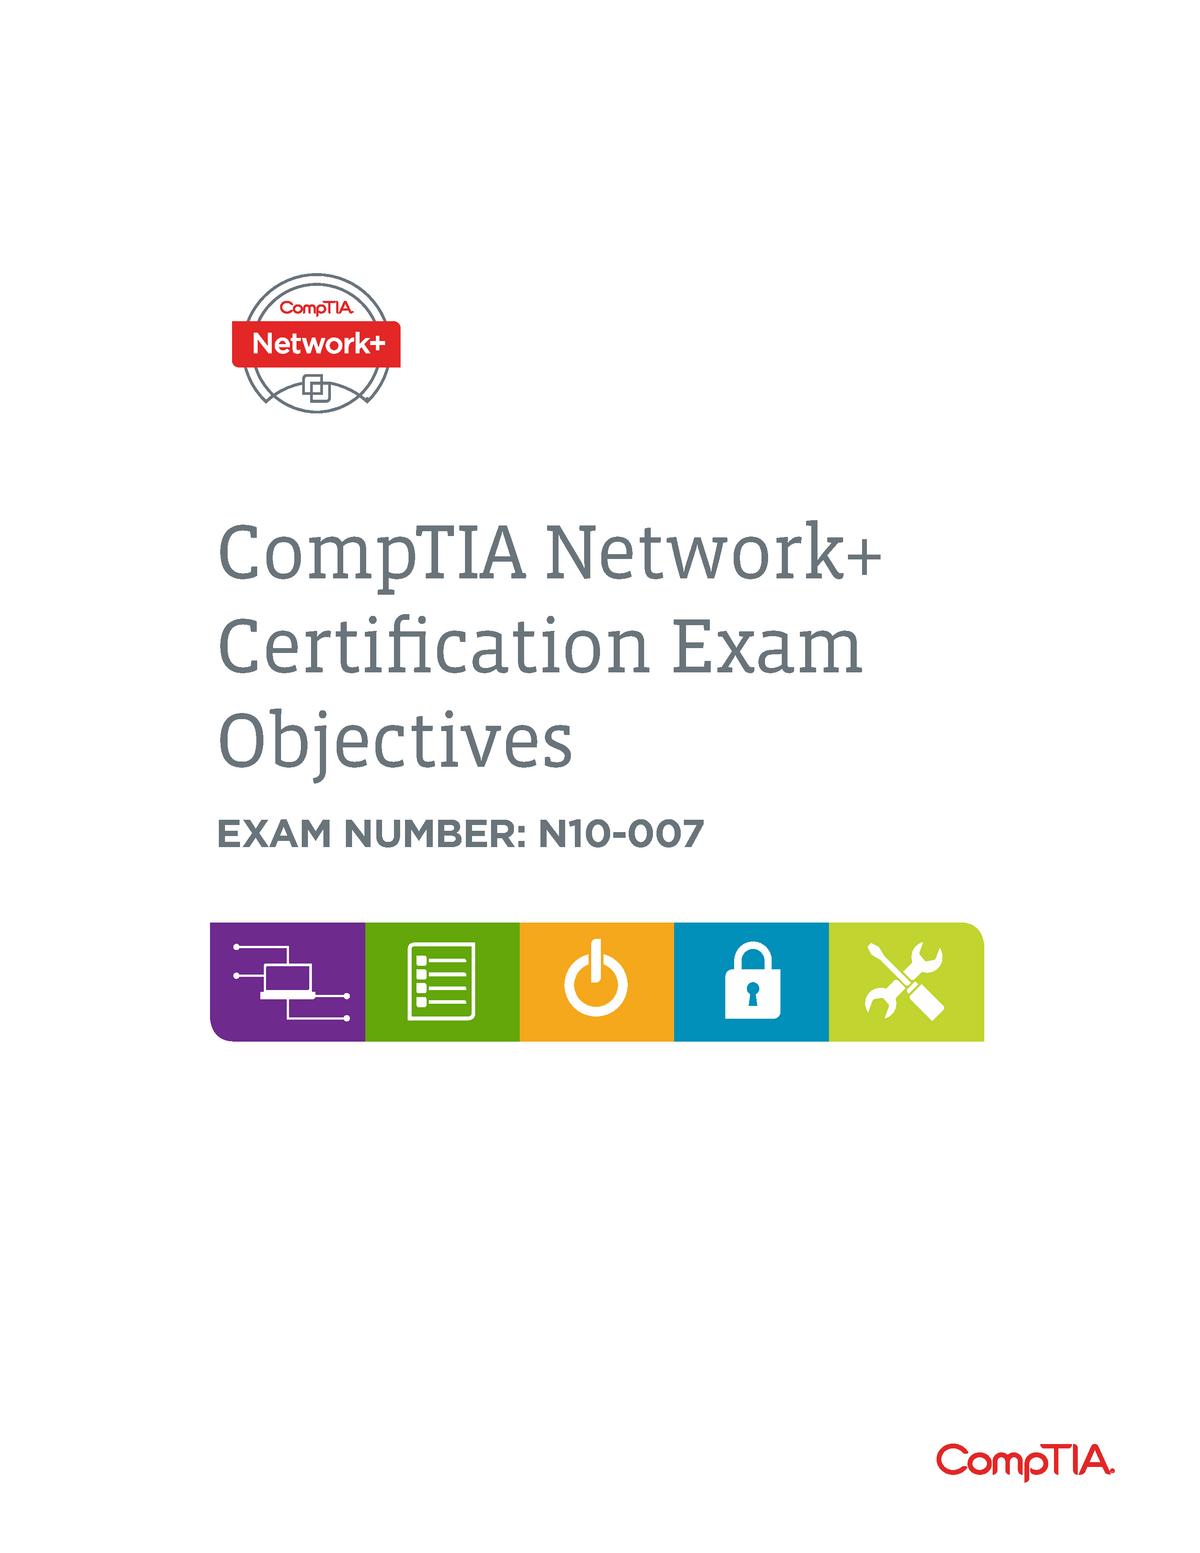 Network N10 007 Exam Objectives - CIS445: Computer systems - StuDocu